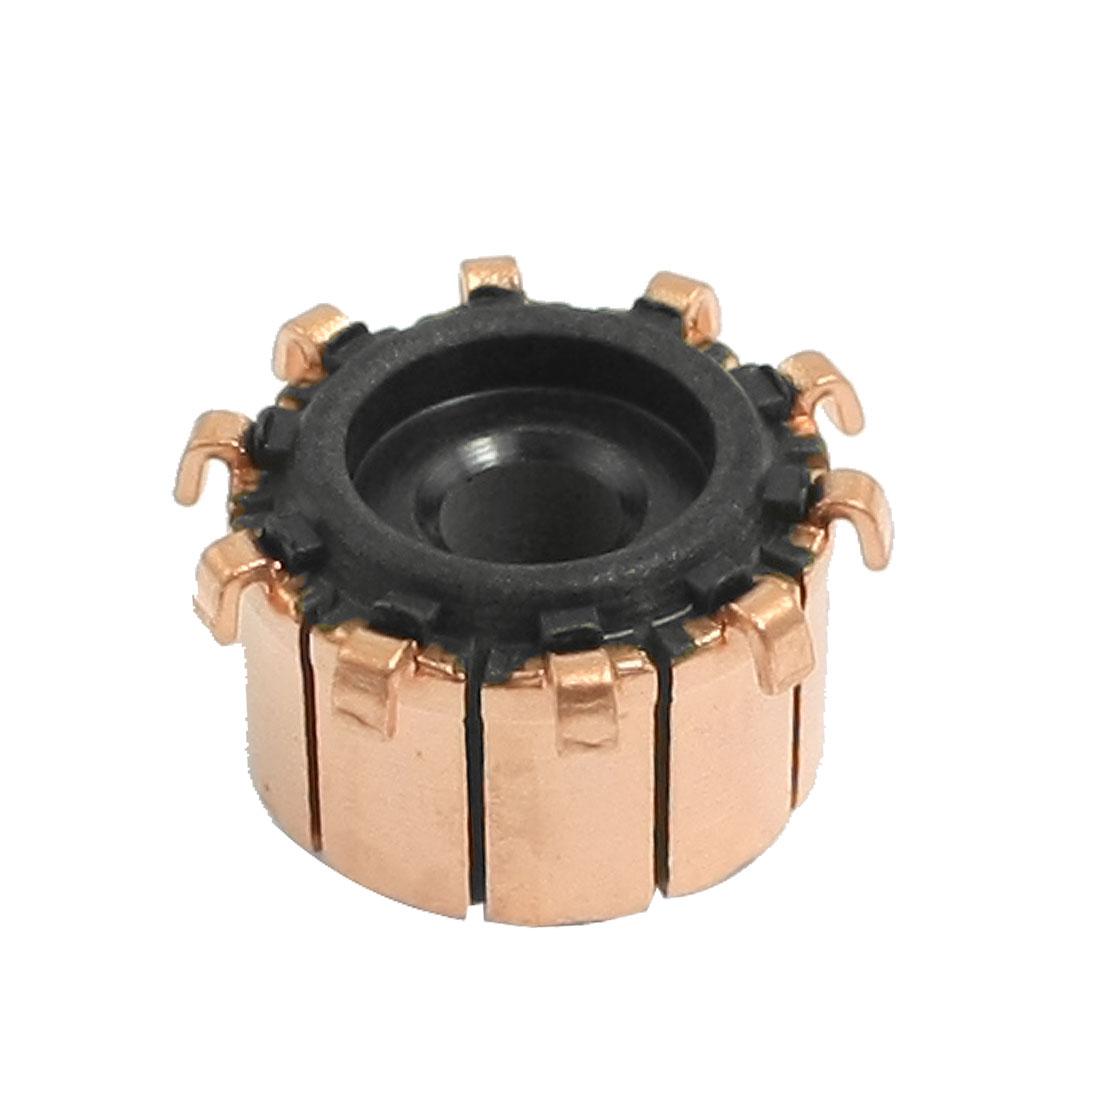 4.5mm x 15mm x 10mm Copper Case Auto Alternator Motor Power Tool Commutator